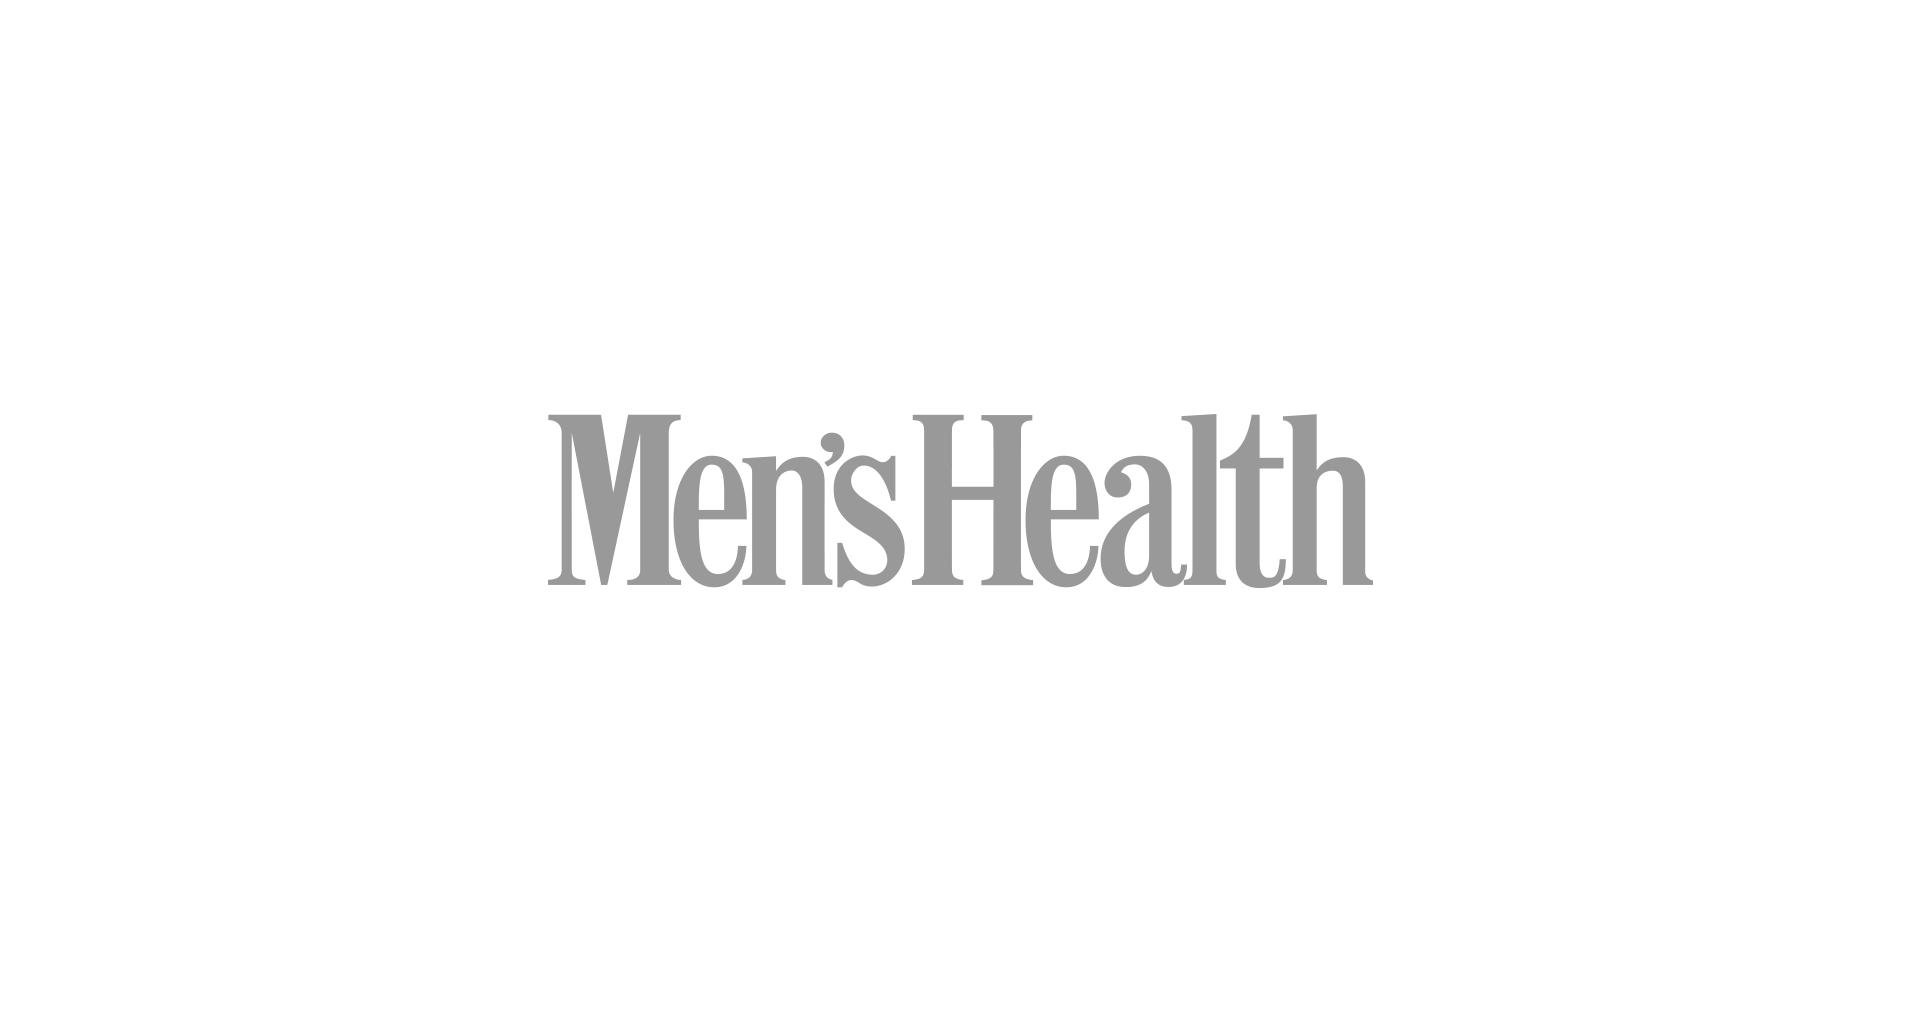 Mens health 1920x1010